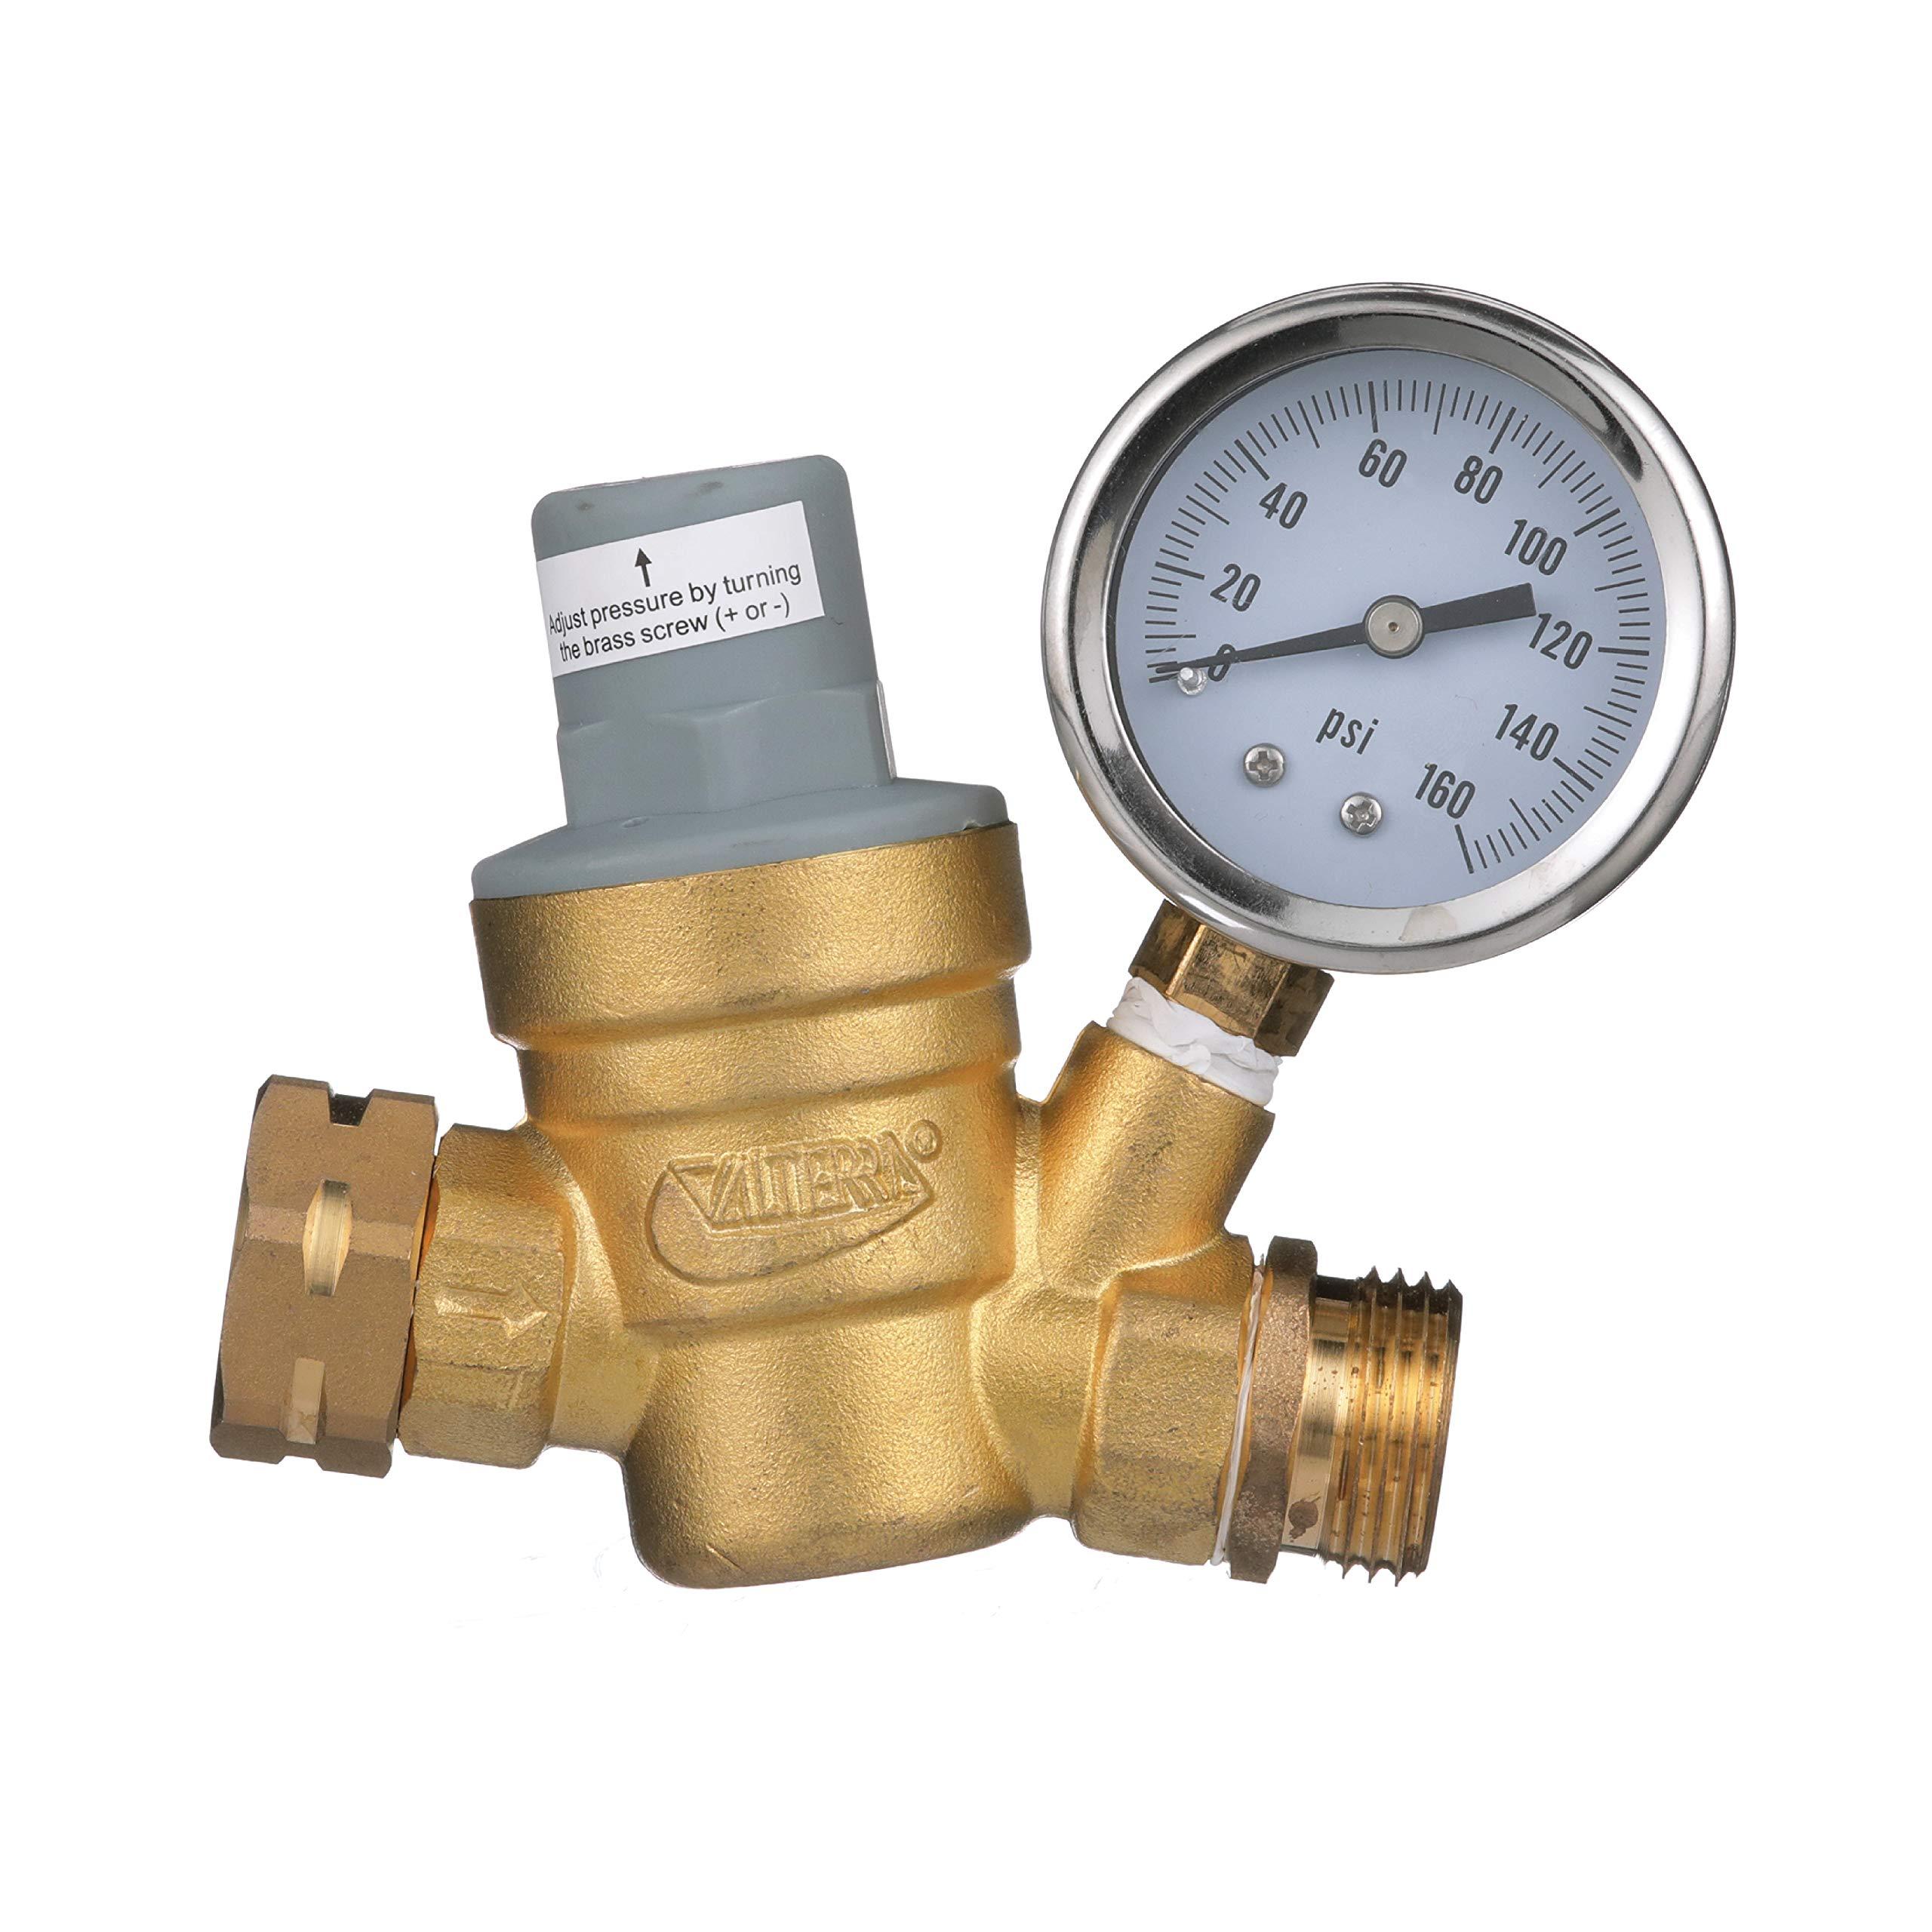 Valterra RV Water Regulator, Lead-Free Brass Adjustable Water Regulator with Pressure Gauge for Camper, Trailer, RV Plumbing System by Valterra